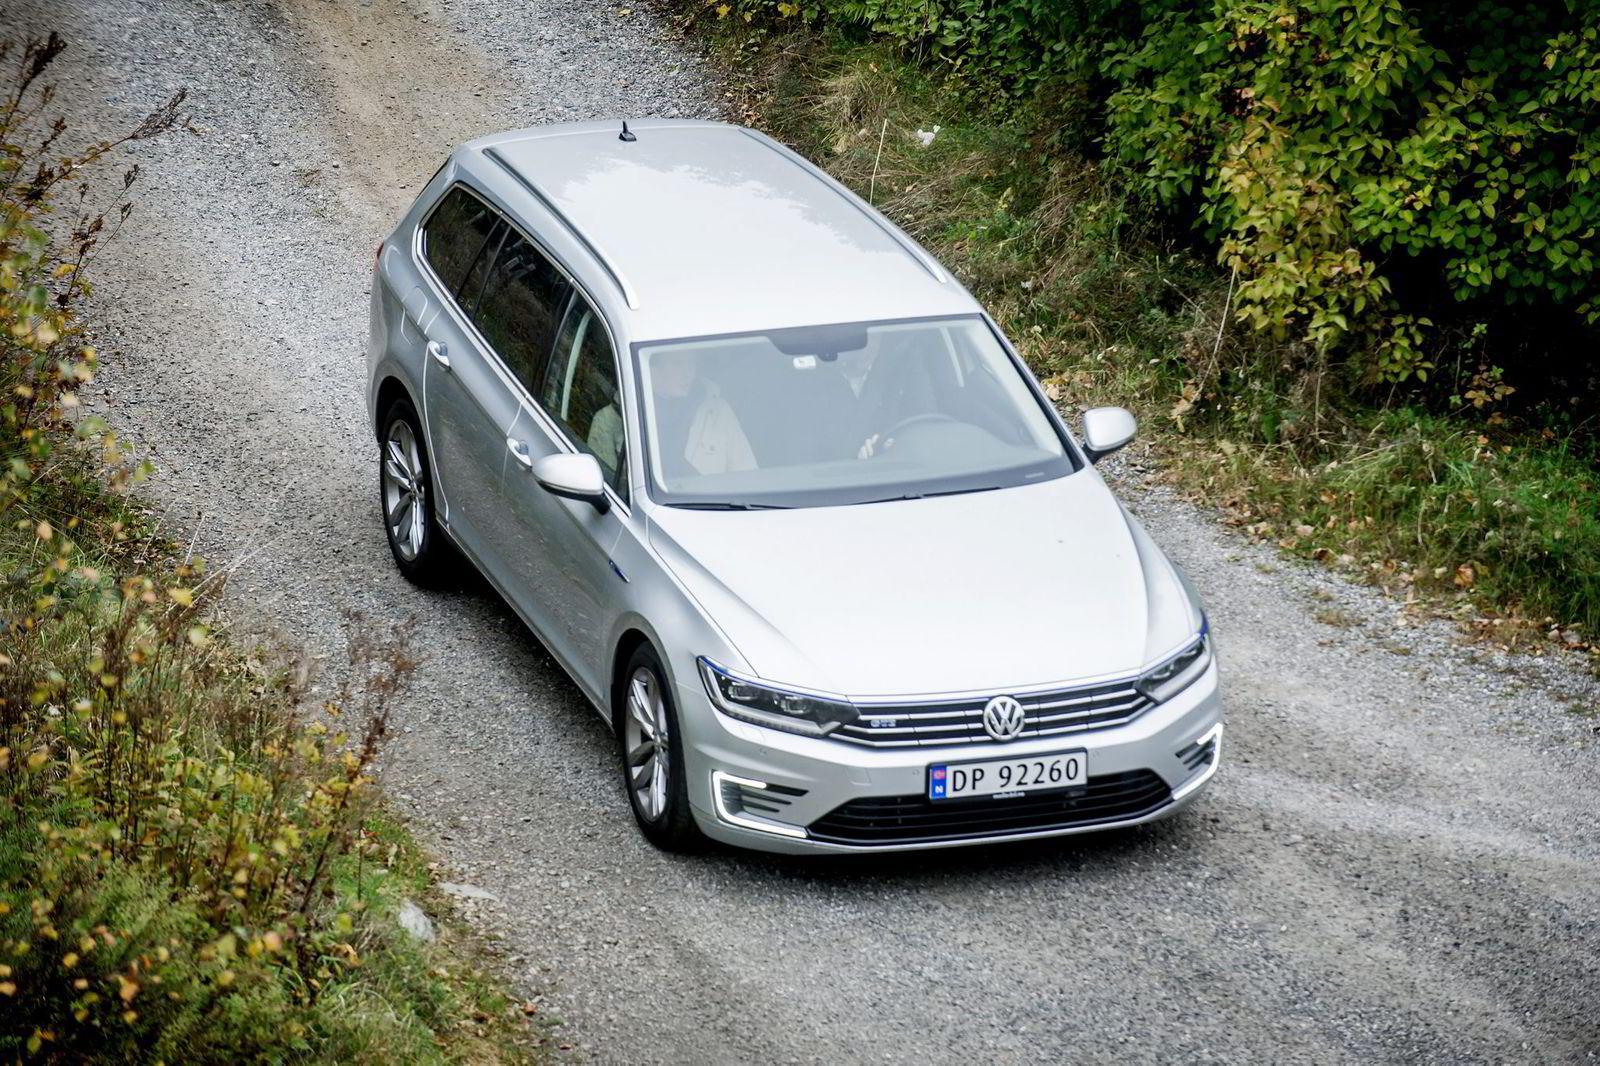 Volkswagen Passat GTE ble nummer to i testen. Foto: Gorm K. Gaare